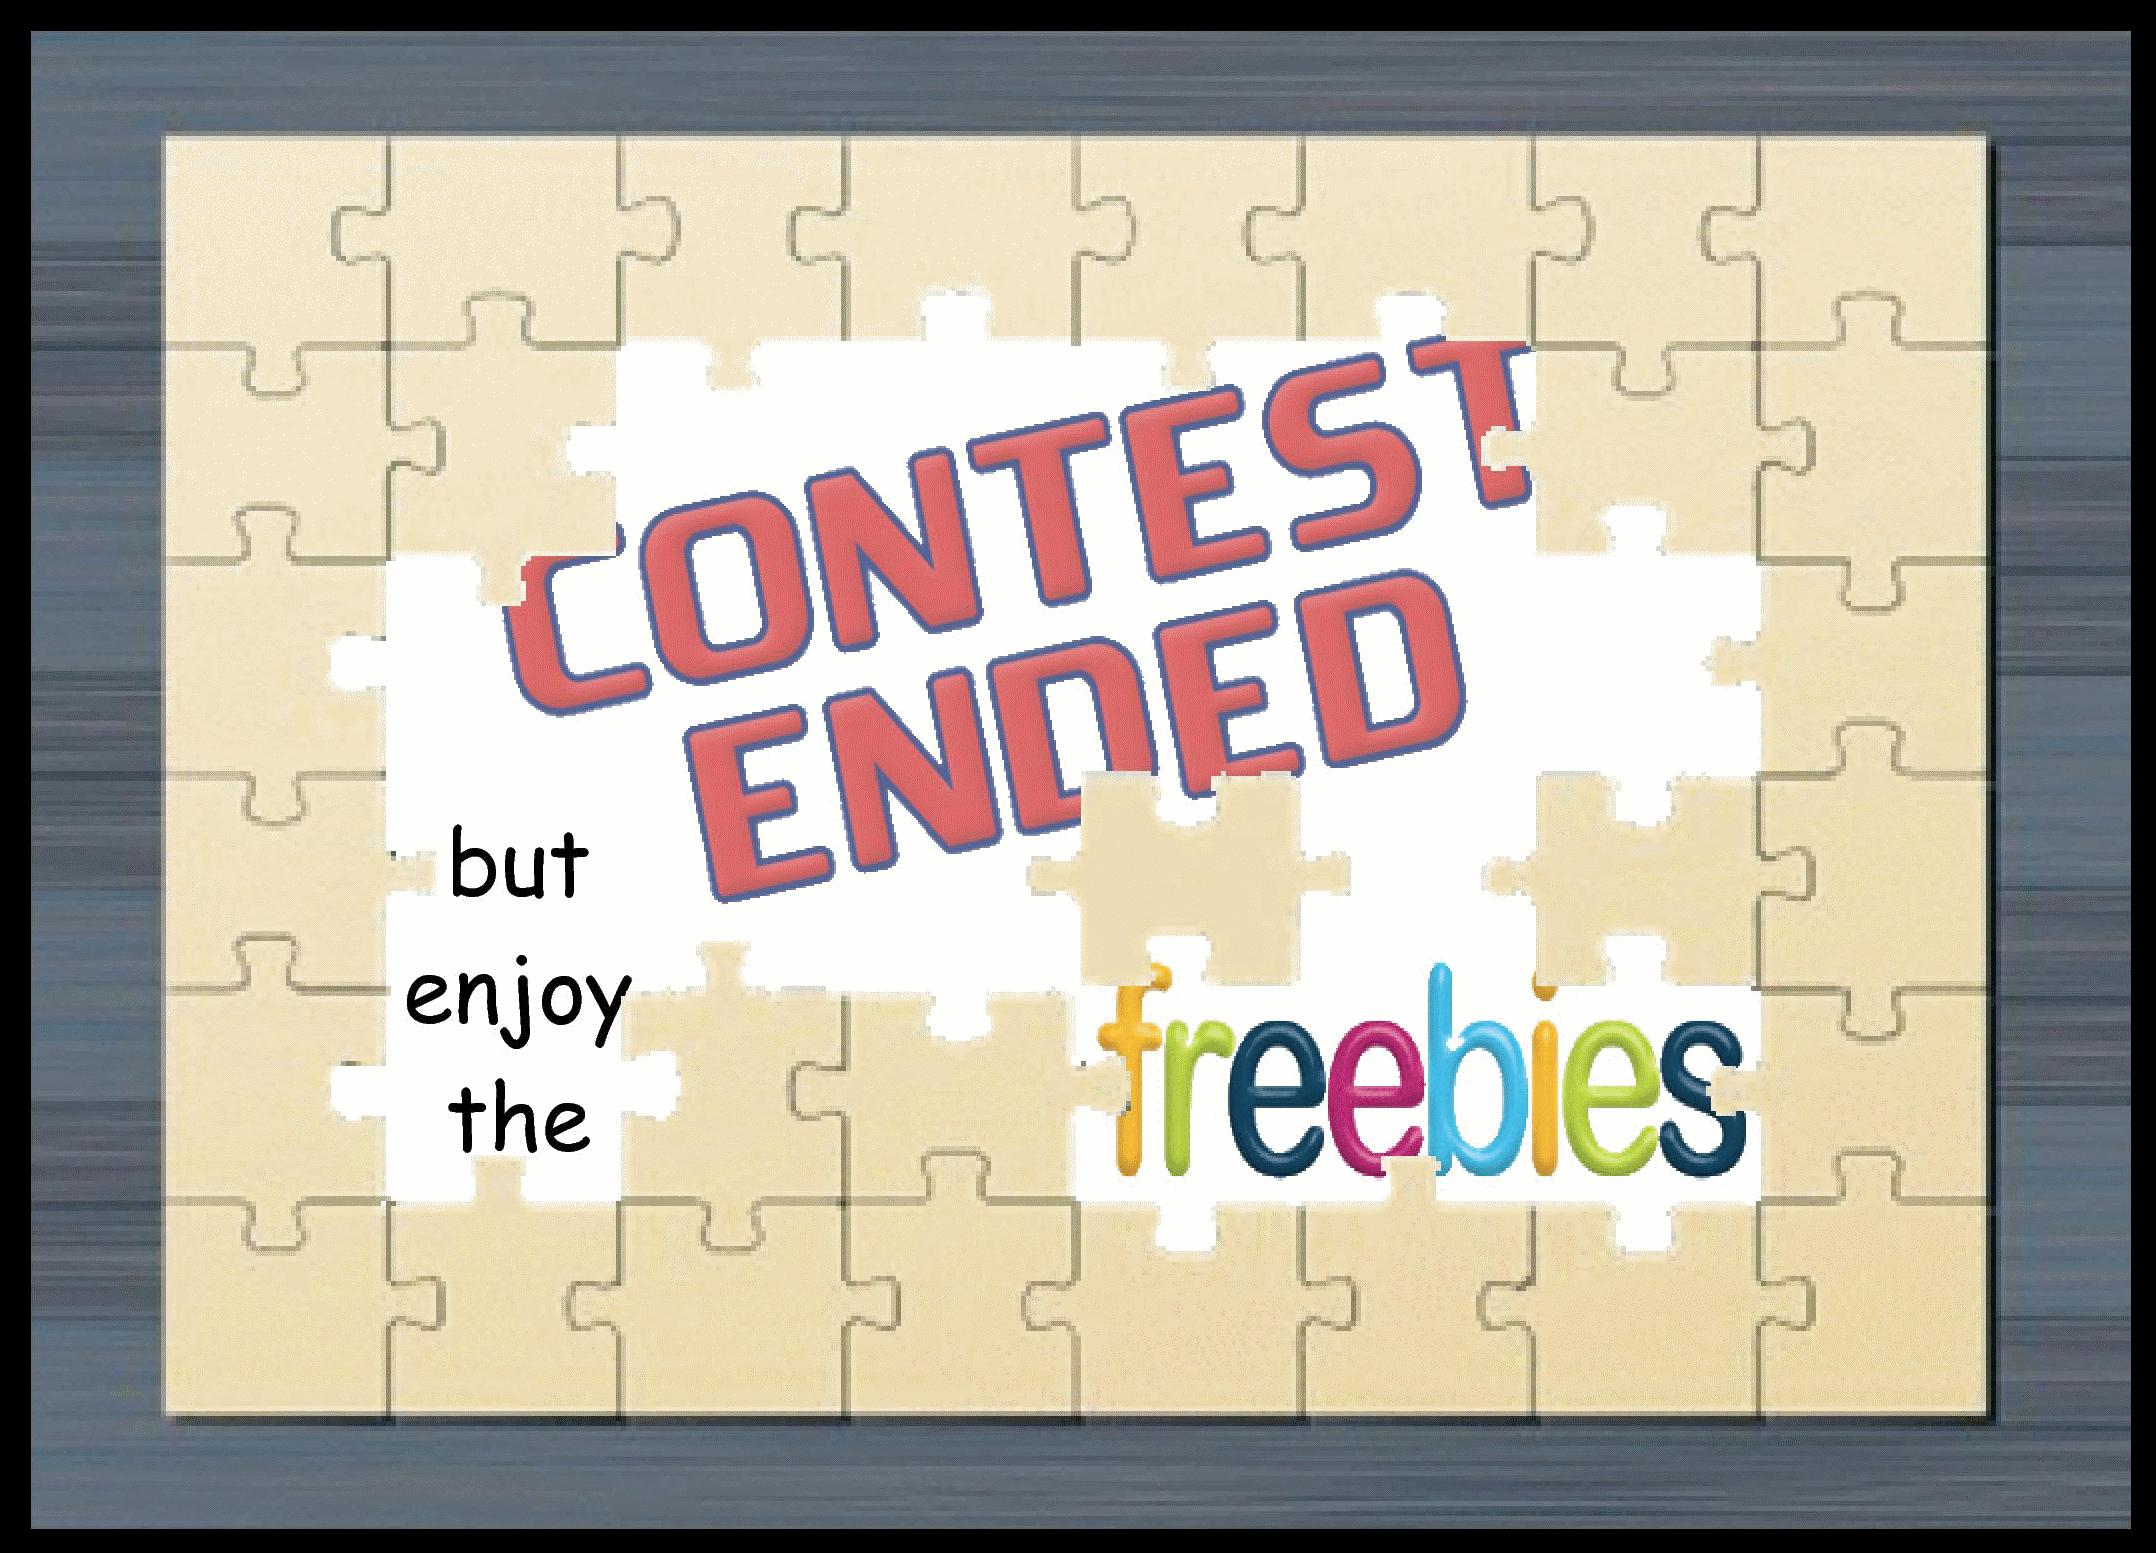 ContestEnd-EnjoyFreebies byElaine